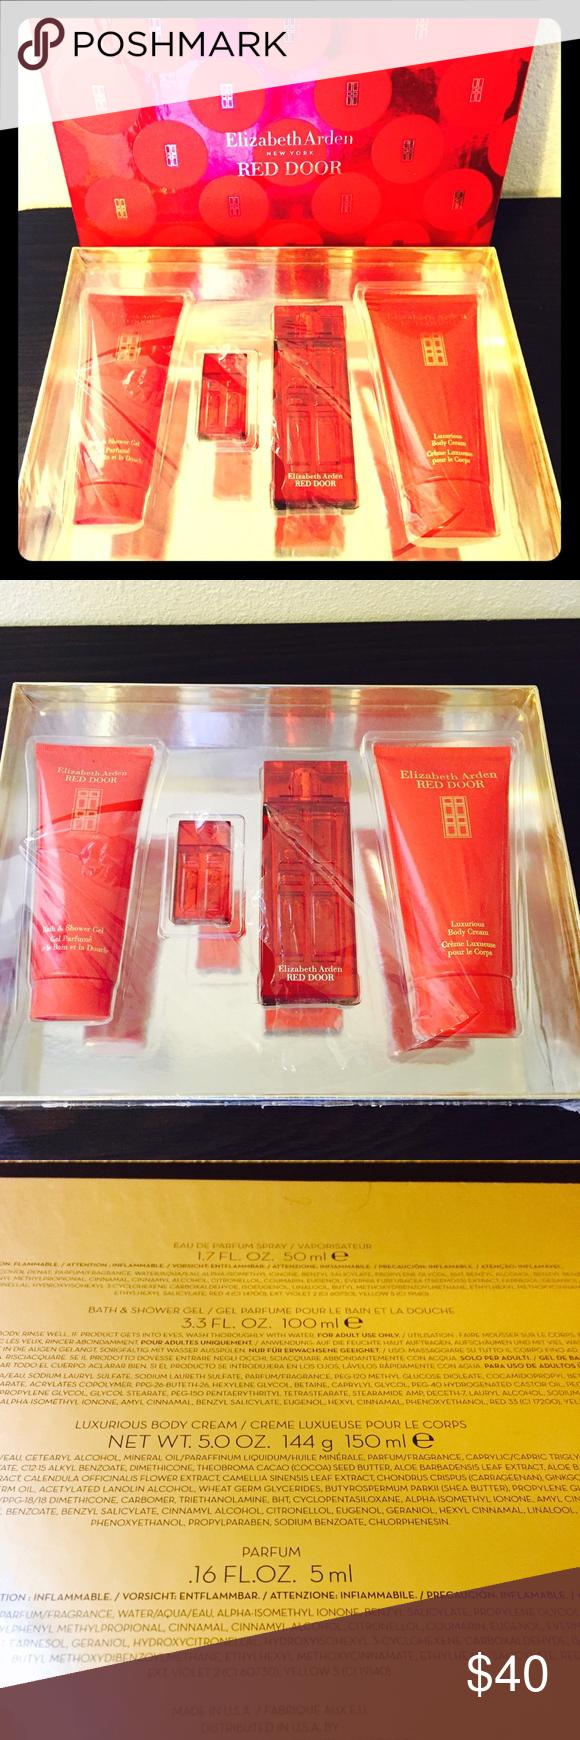 Elizabeth Arden Red Door Perfume Set Nwt My Posh Picks